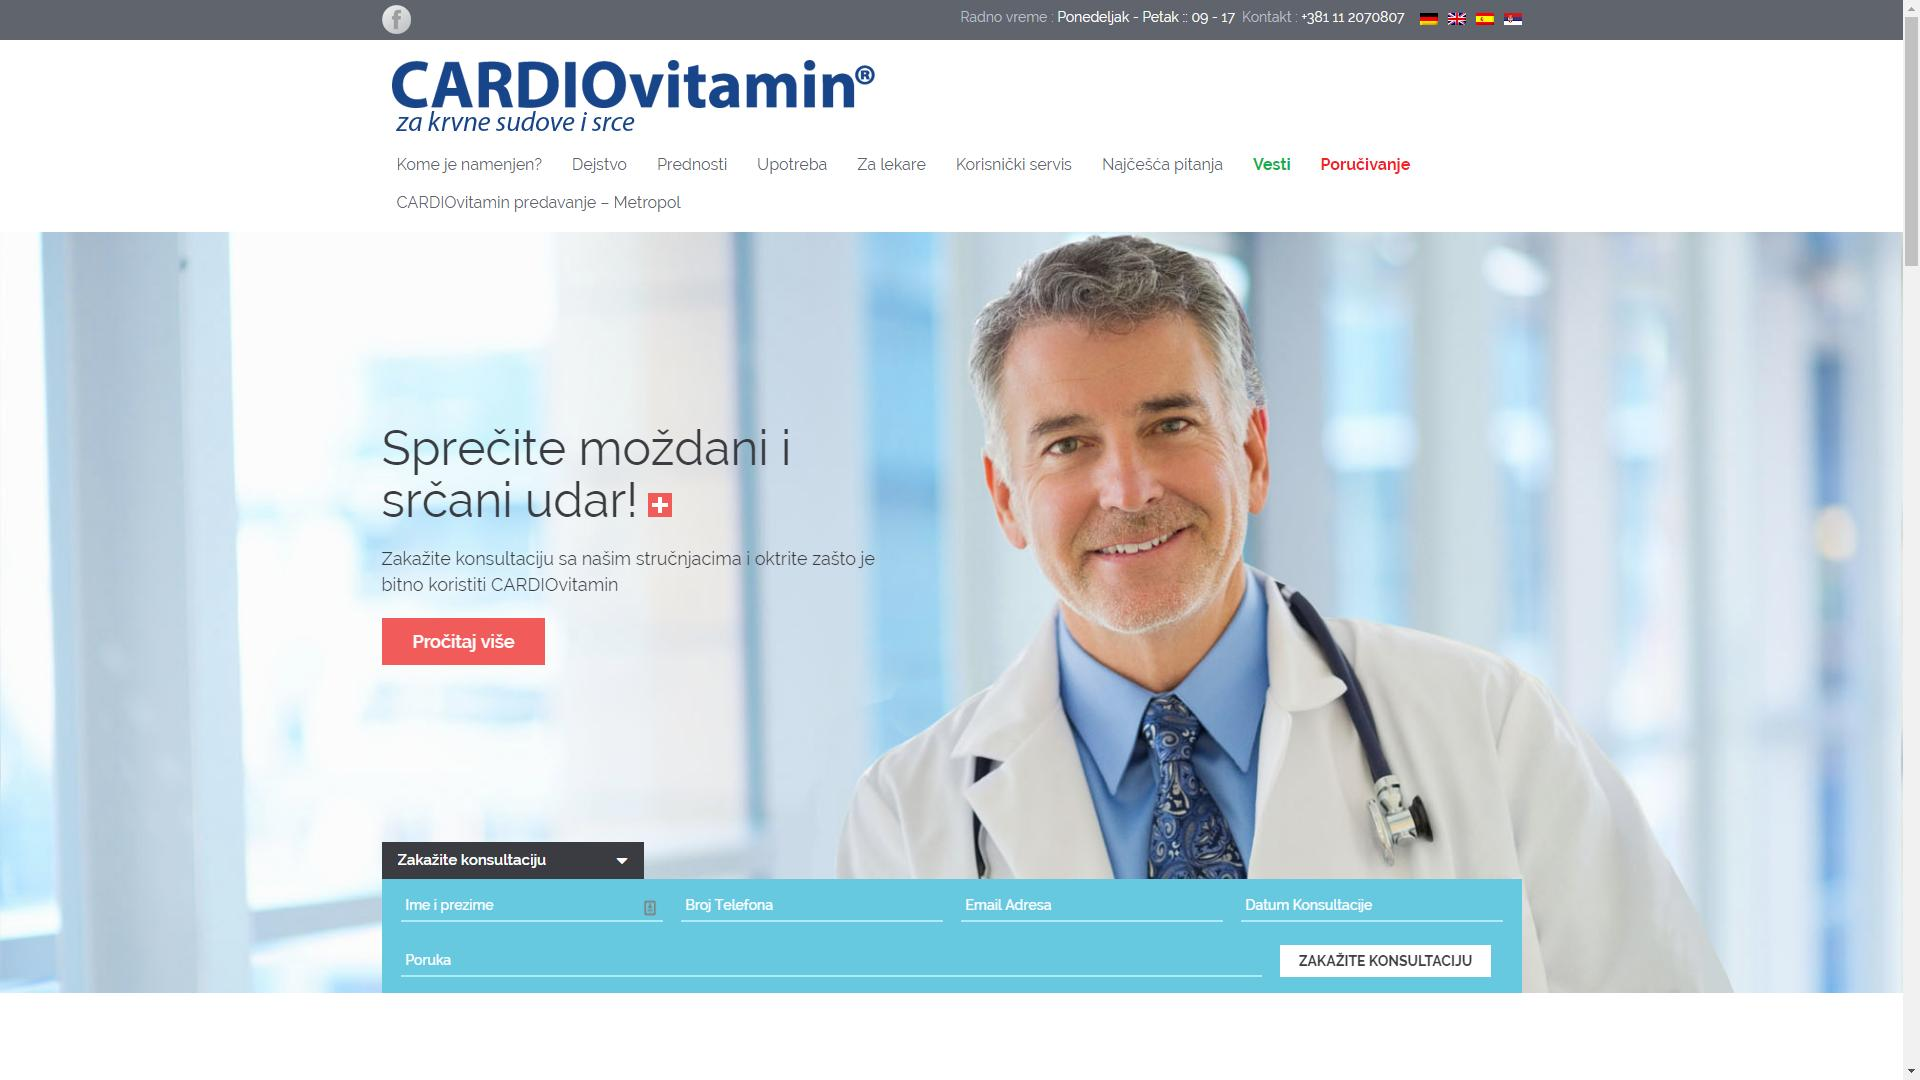 sKa portfolio sajtovi - Cardiovitamin